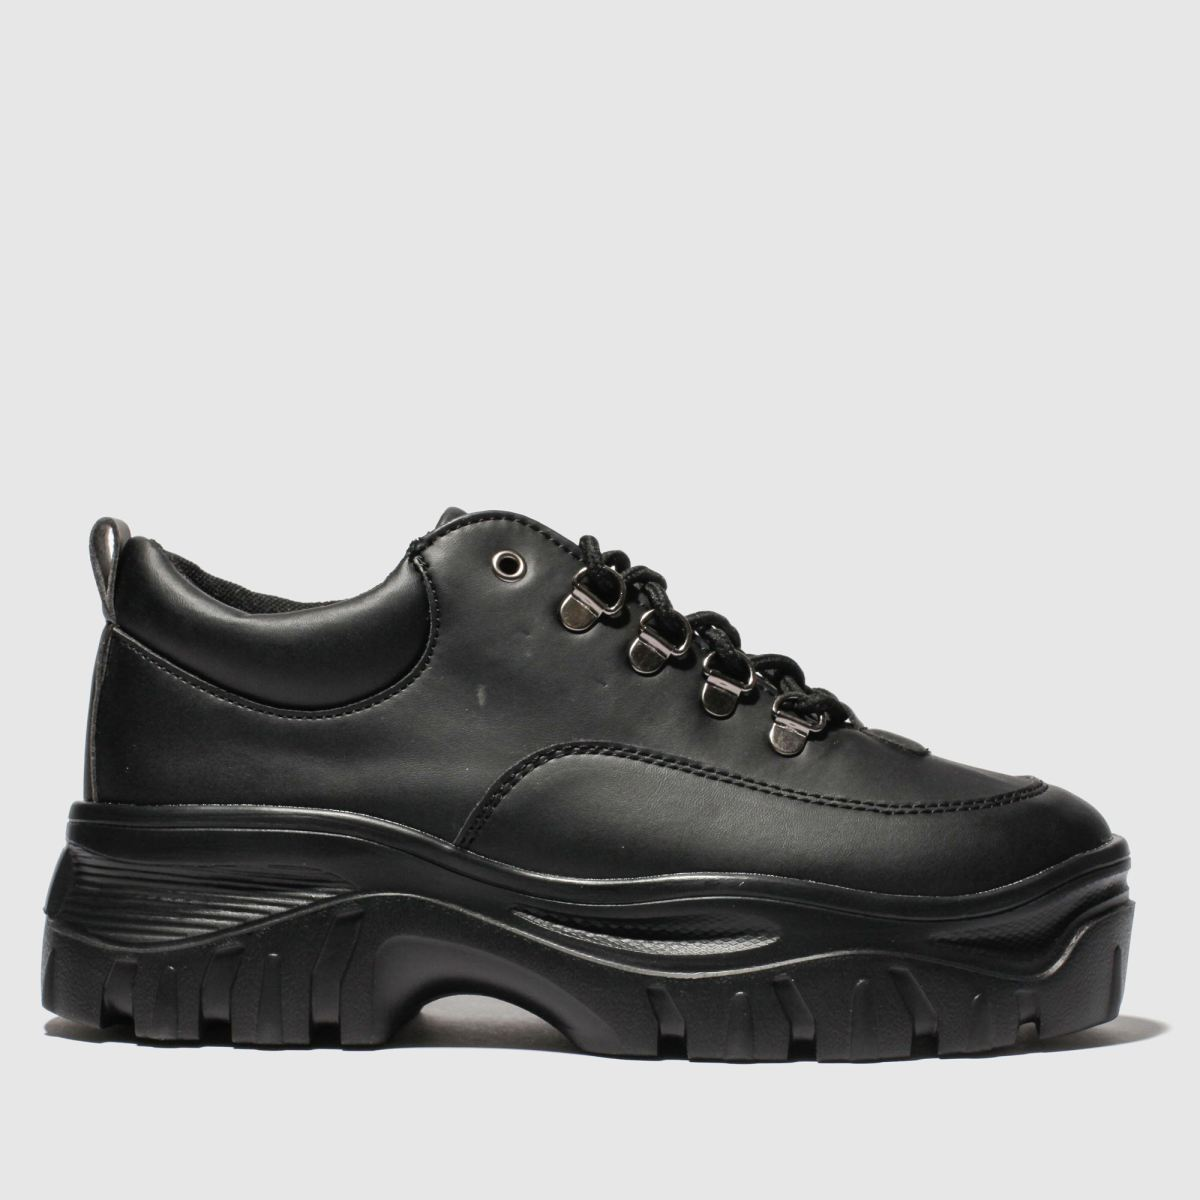 schuh Schuh Black Atmosphere Flat Shoes